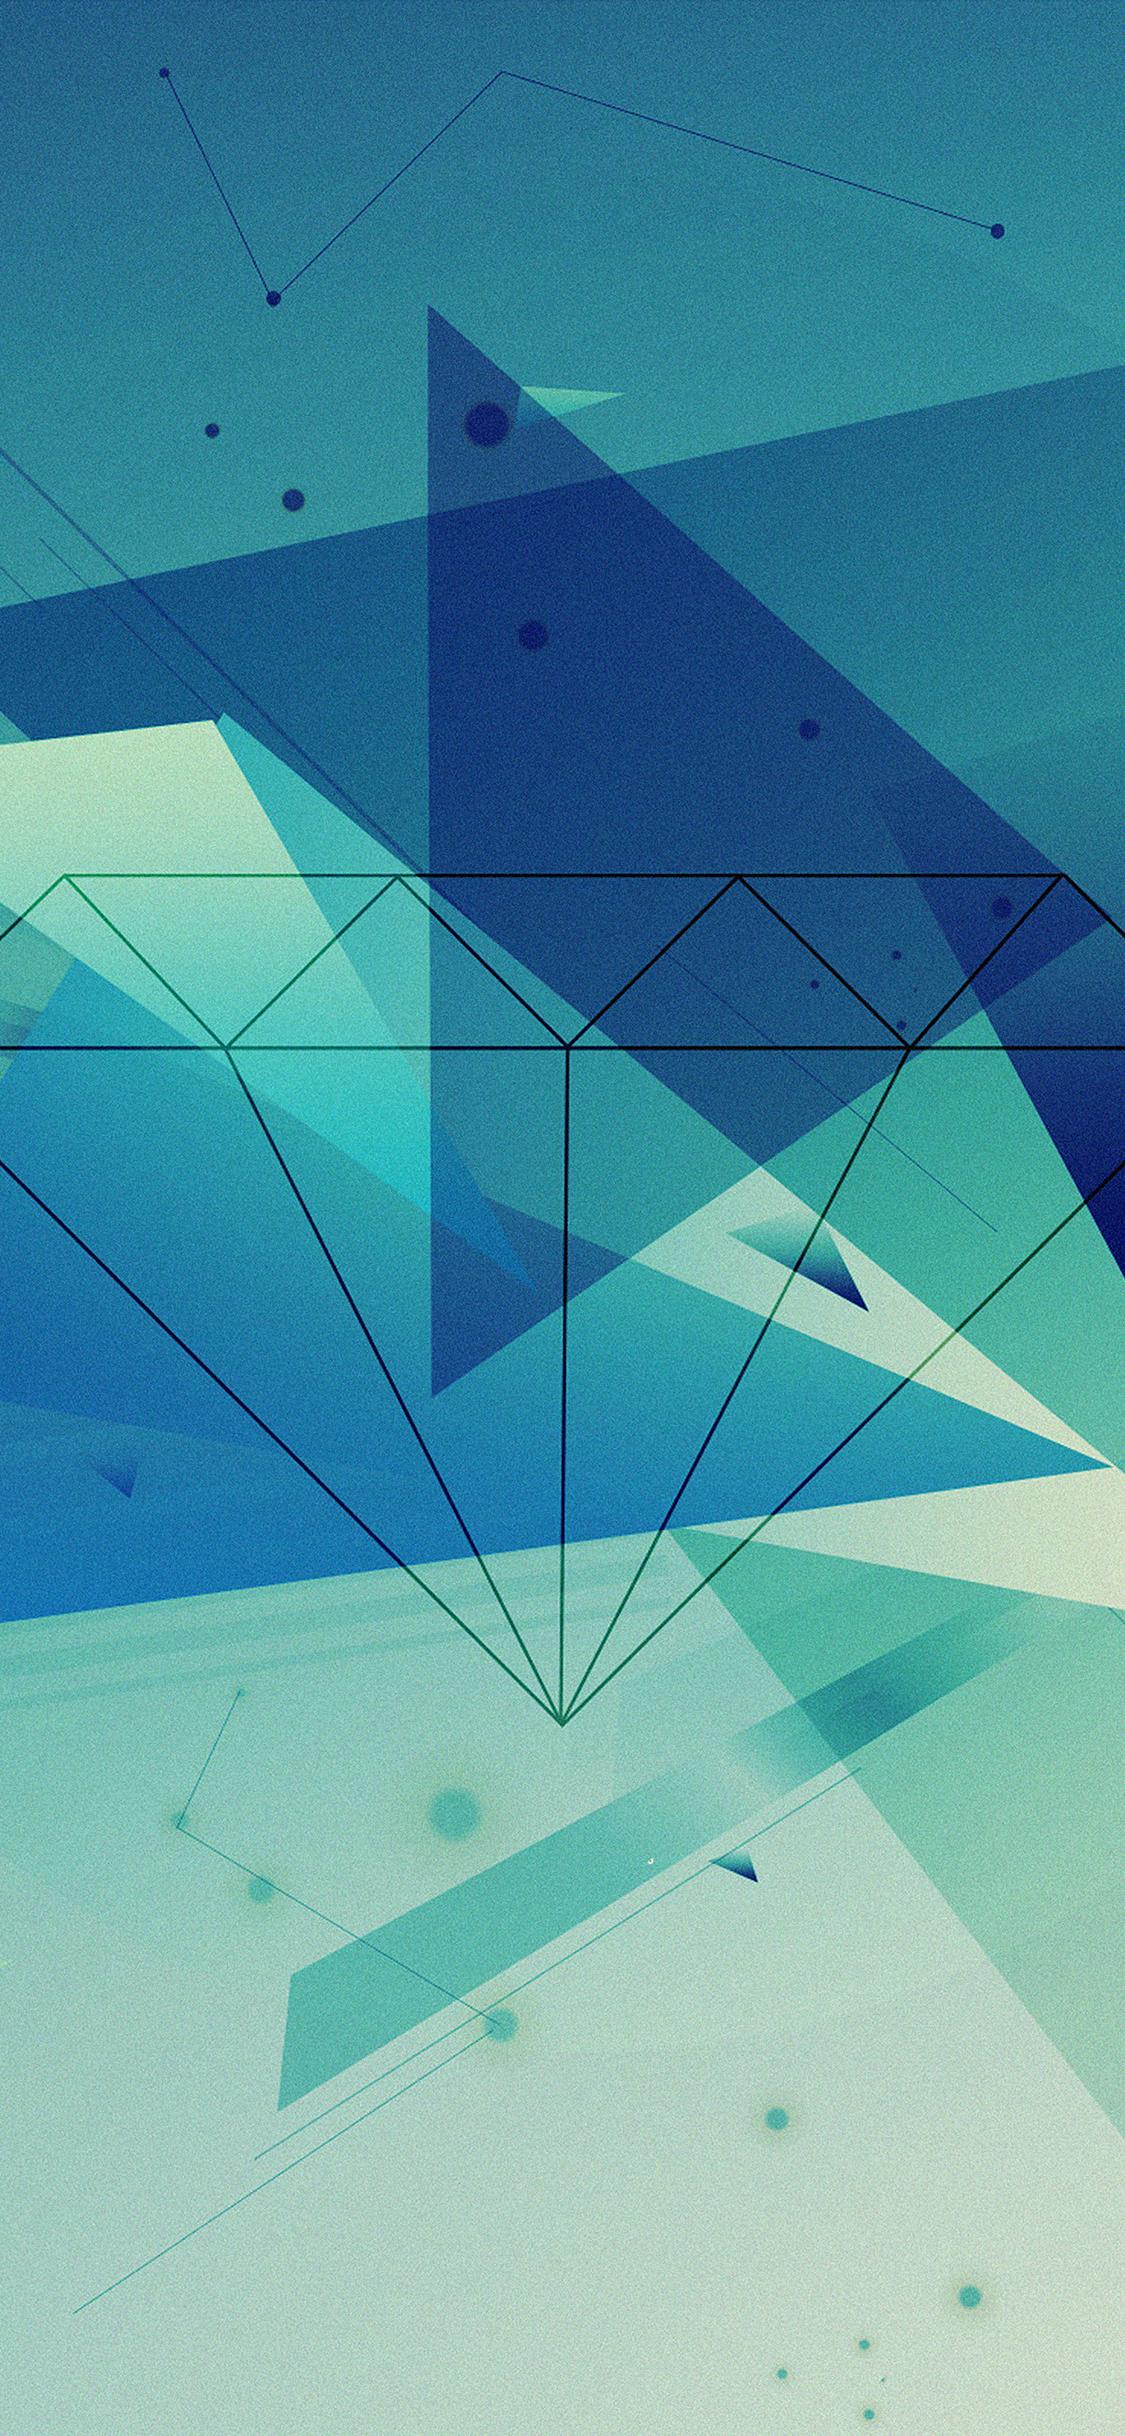 iPhoneXpapers.com-Apple-iPhone-wallpaper-vb89-wallpaper-diamond-blue-illust-graphic-art